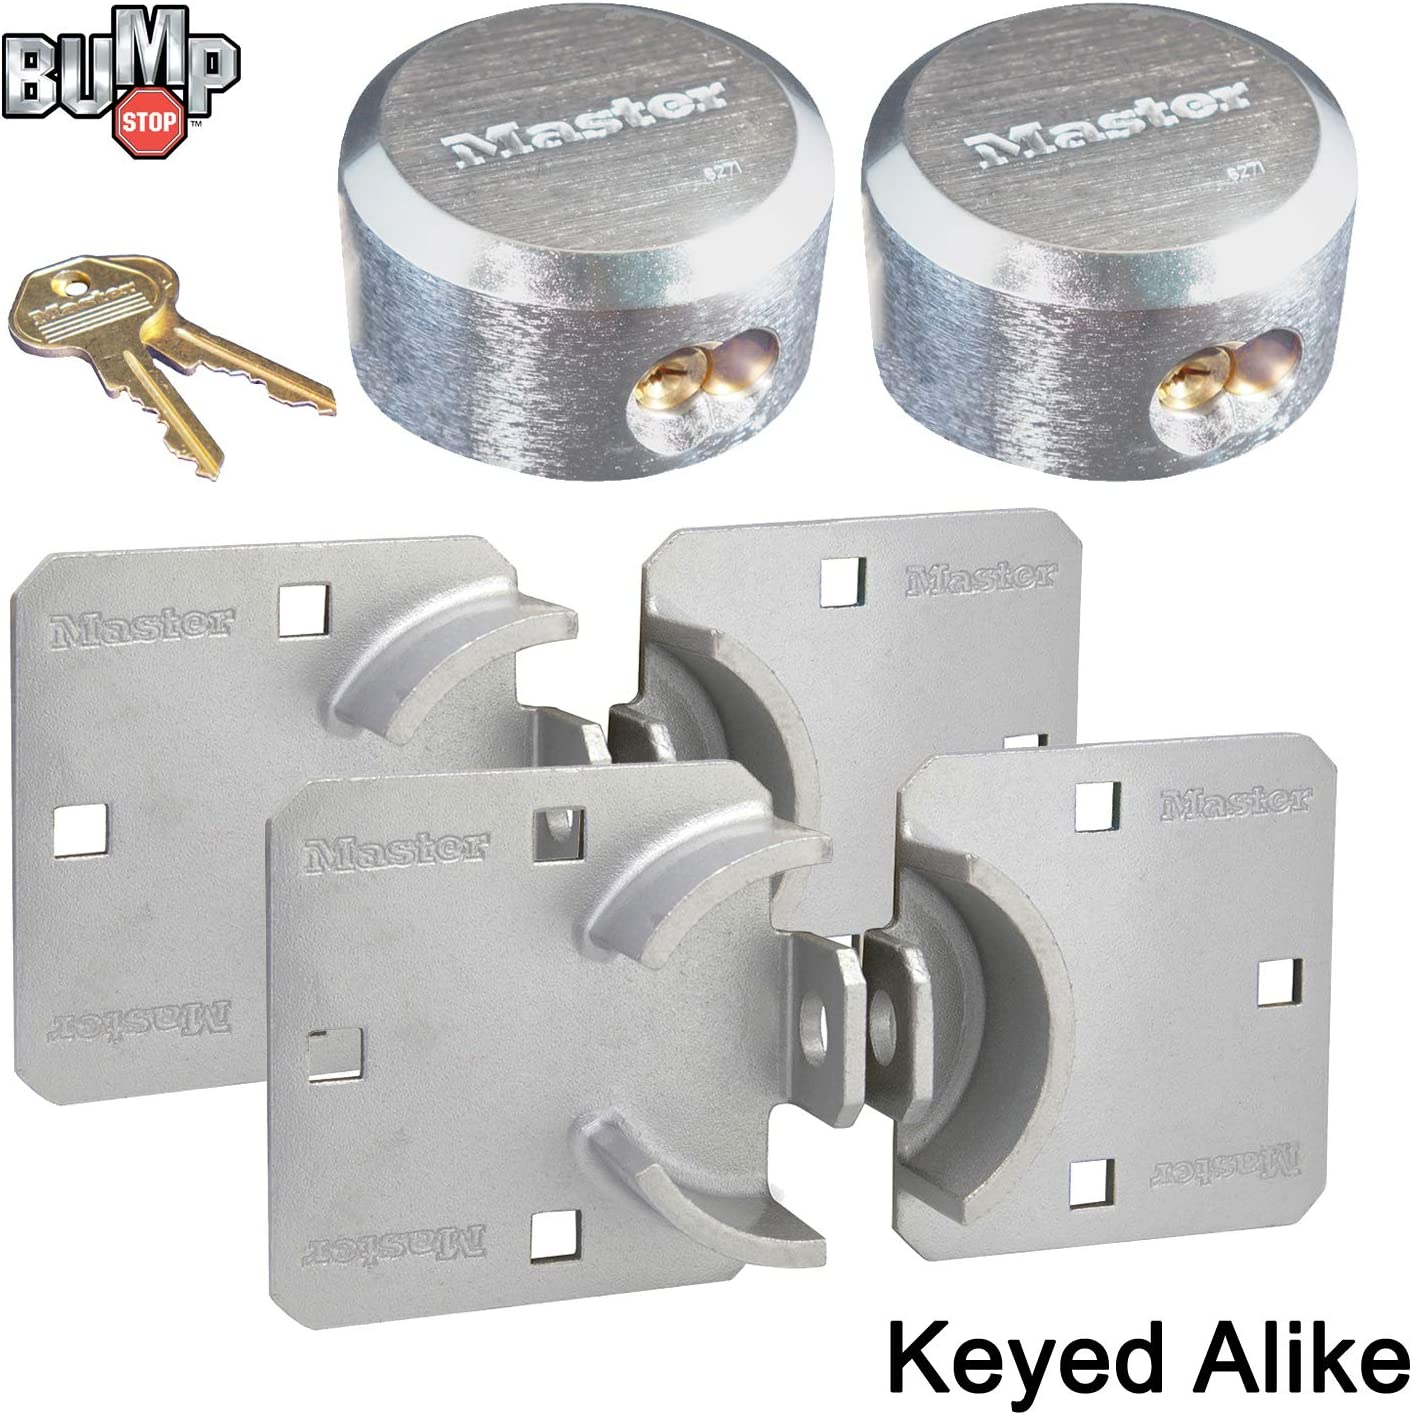 Lock by Master 6271KA /& Hasp 770 KEYED ALIKE Hidden Shackle Extreme Security